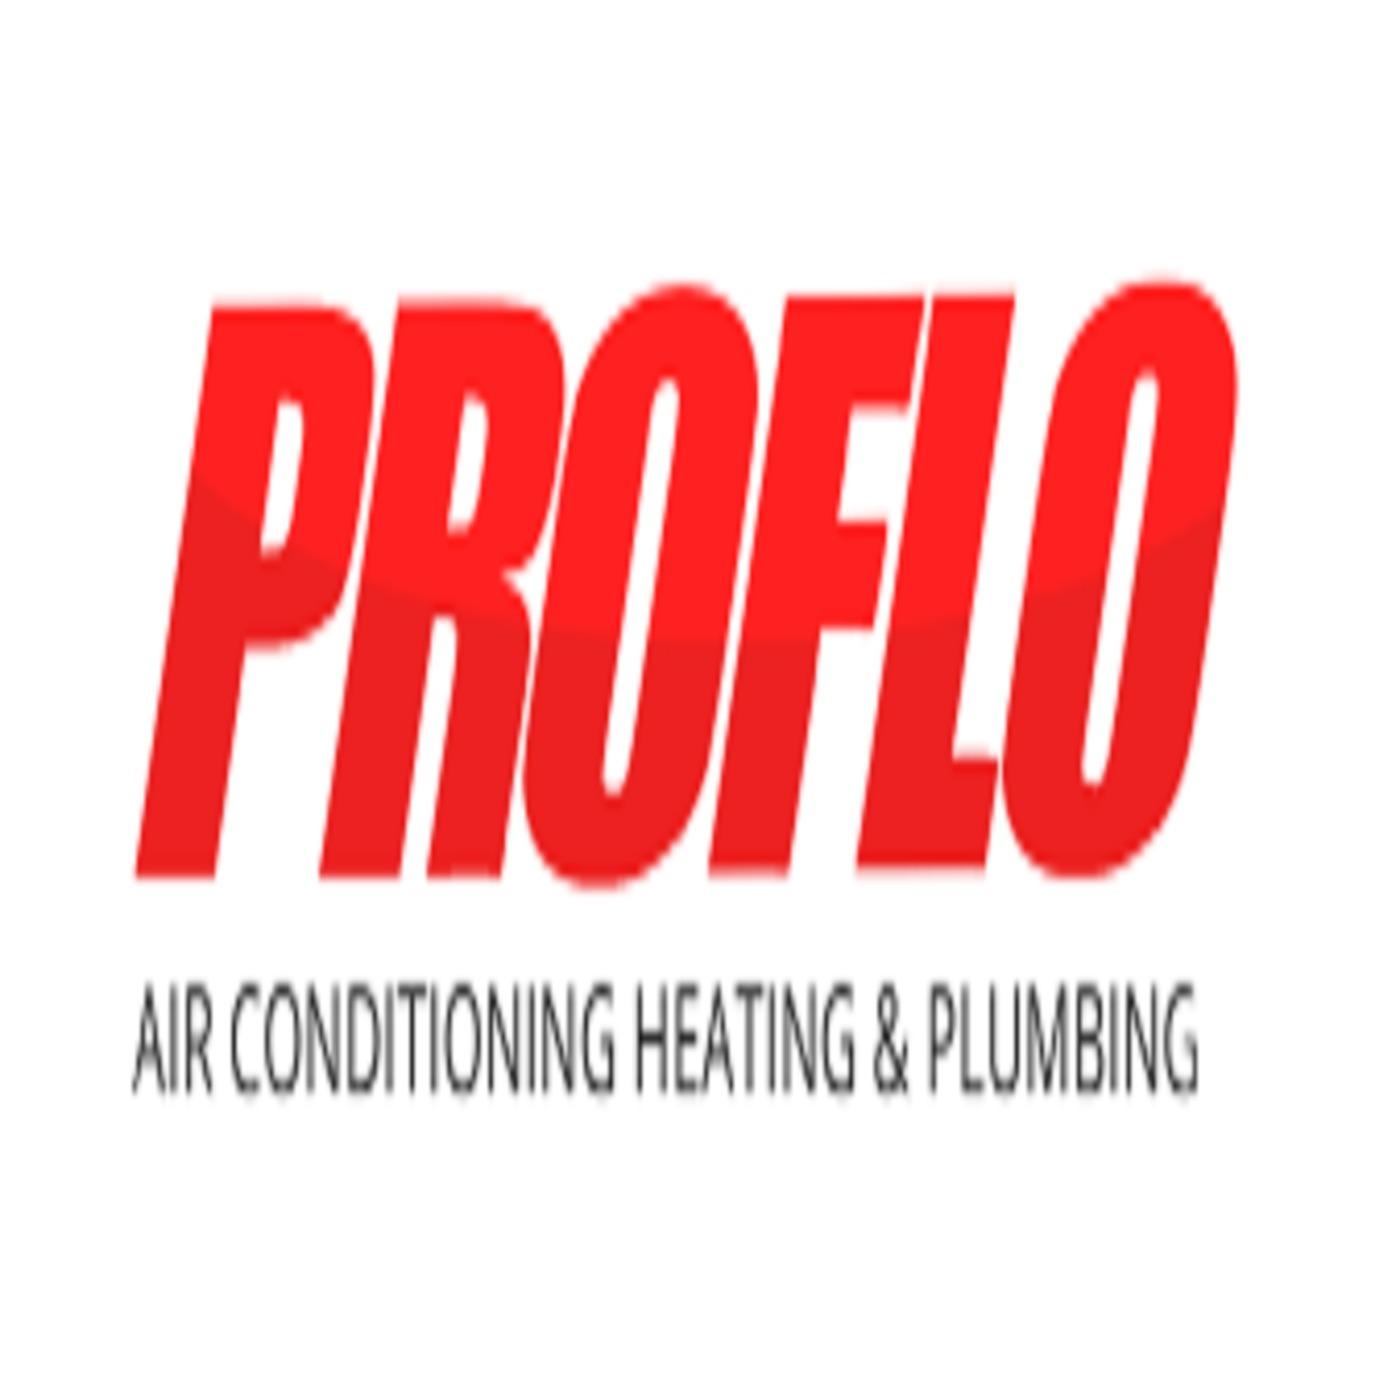 ProFlo Air Conditioning, Heating & Plumbing (@proflohvac3) Cover Image